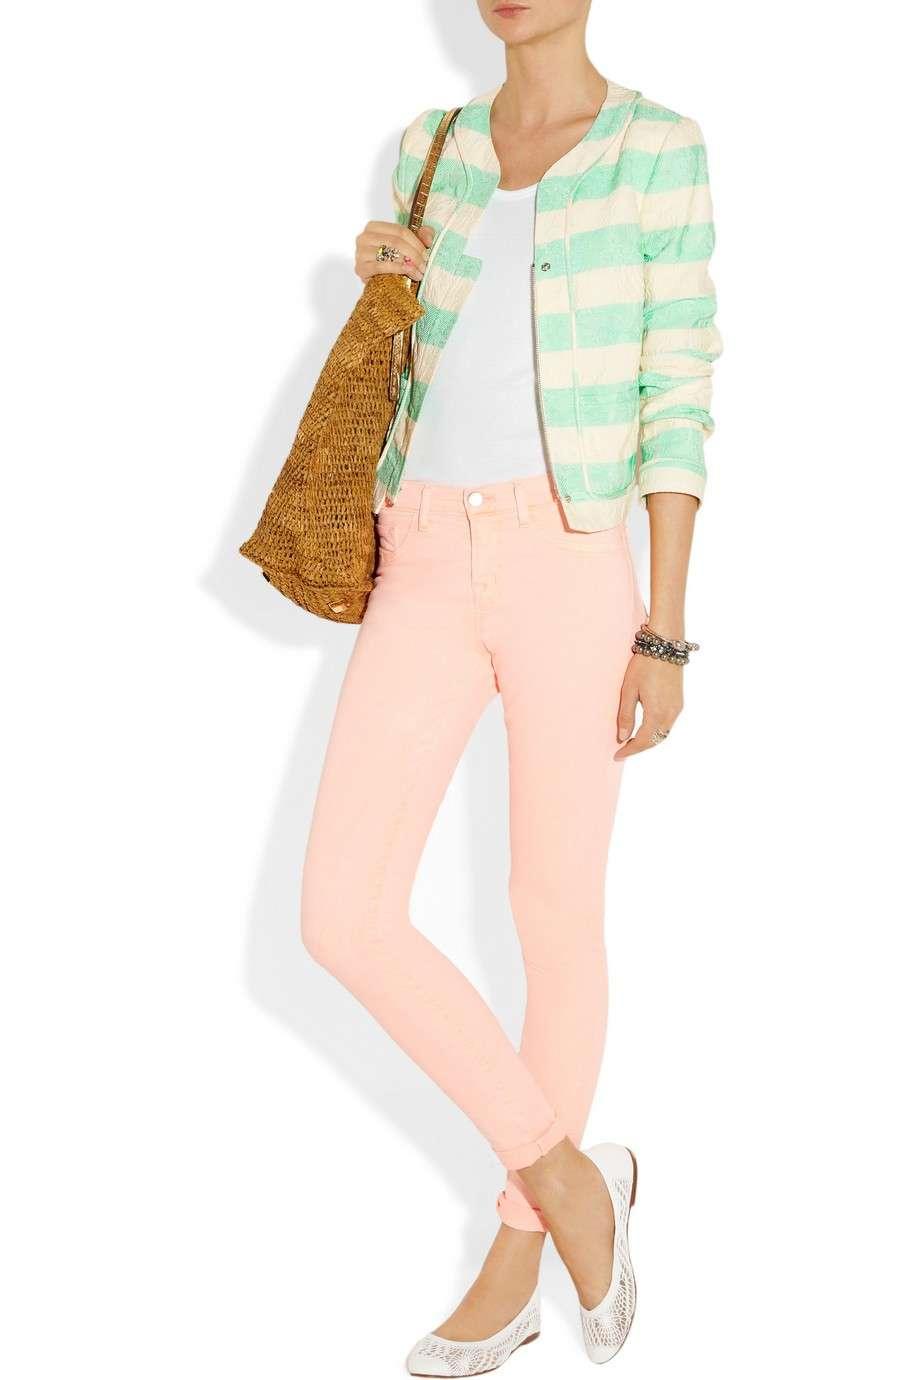 Ballerine bianche e pantaloni pastello